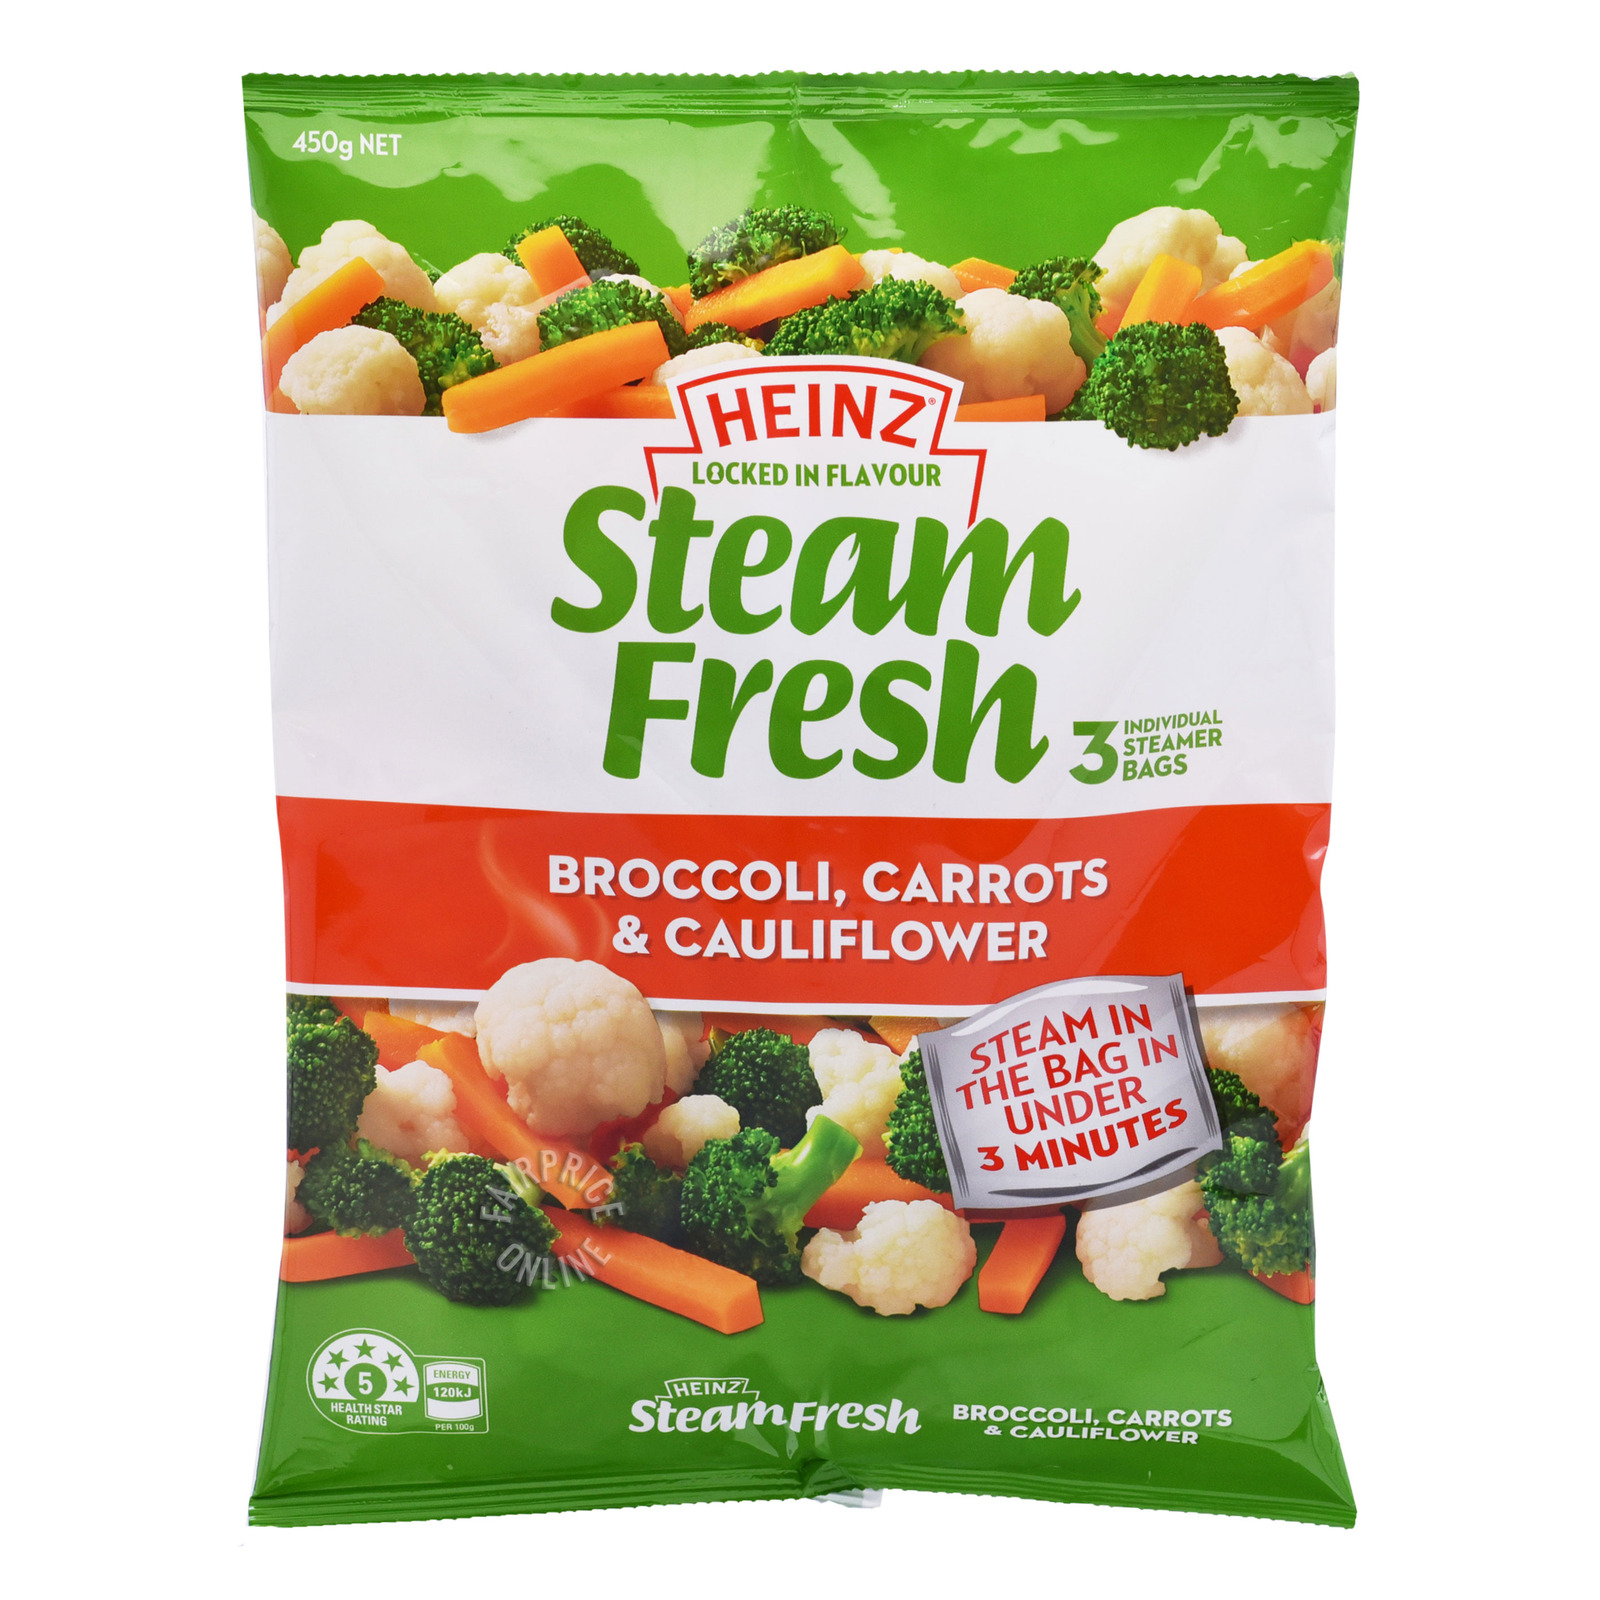 Heinz Steam Fresh Vegetables Bags - Broccoli,Carrots&Cauliflower